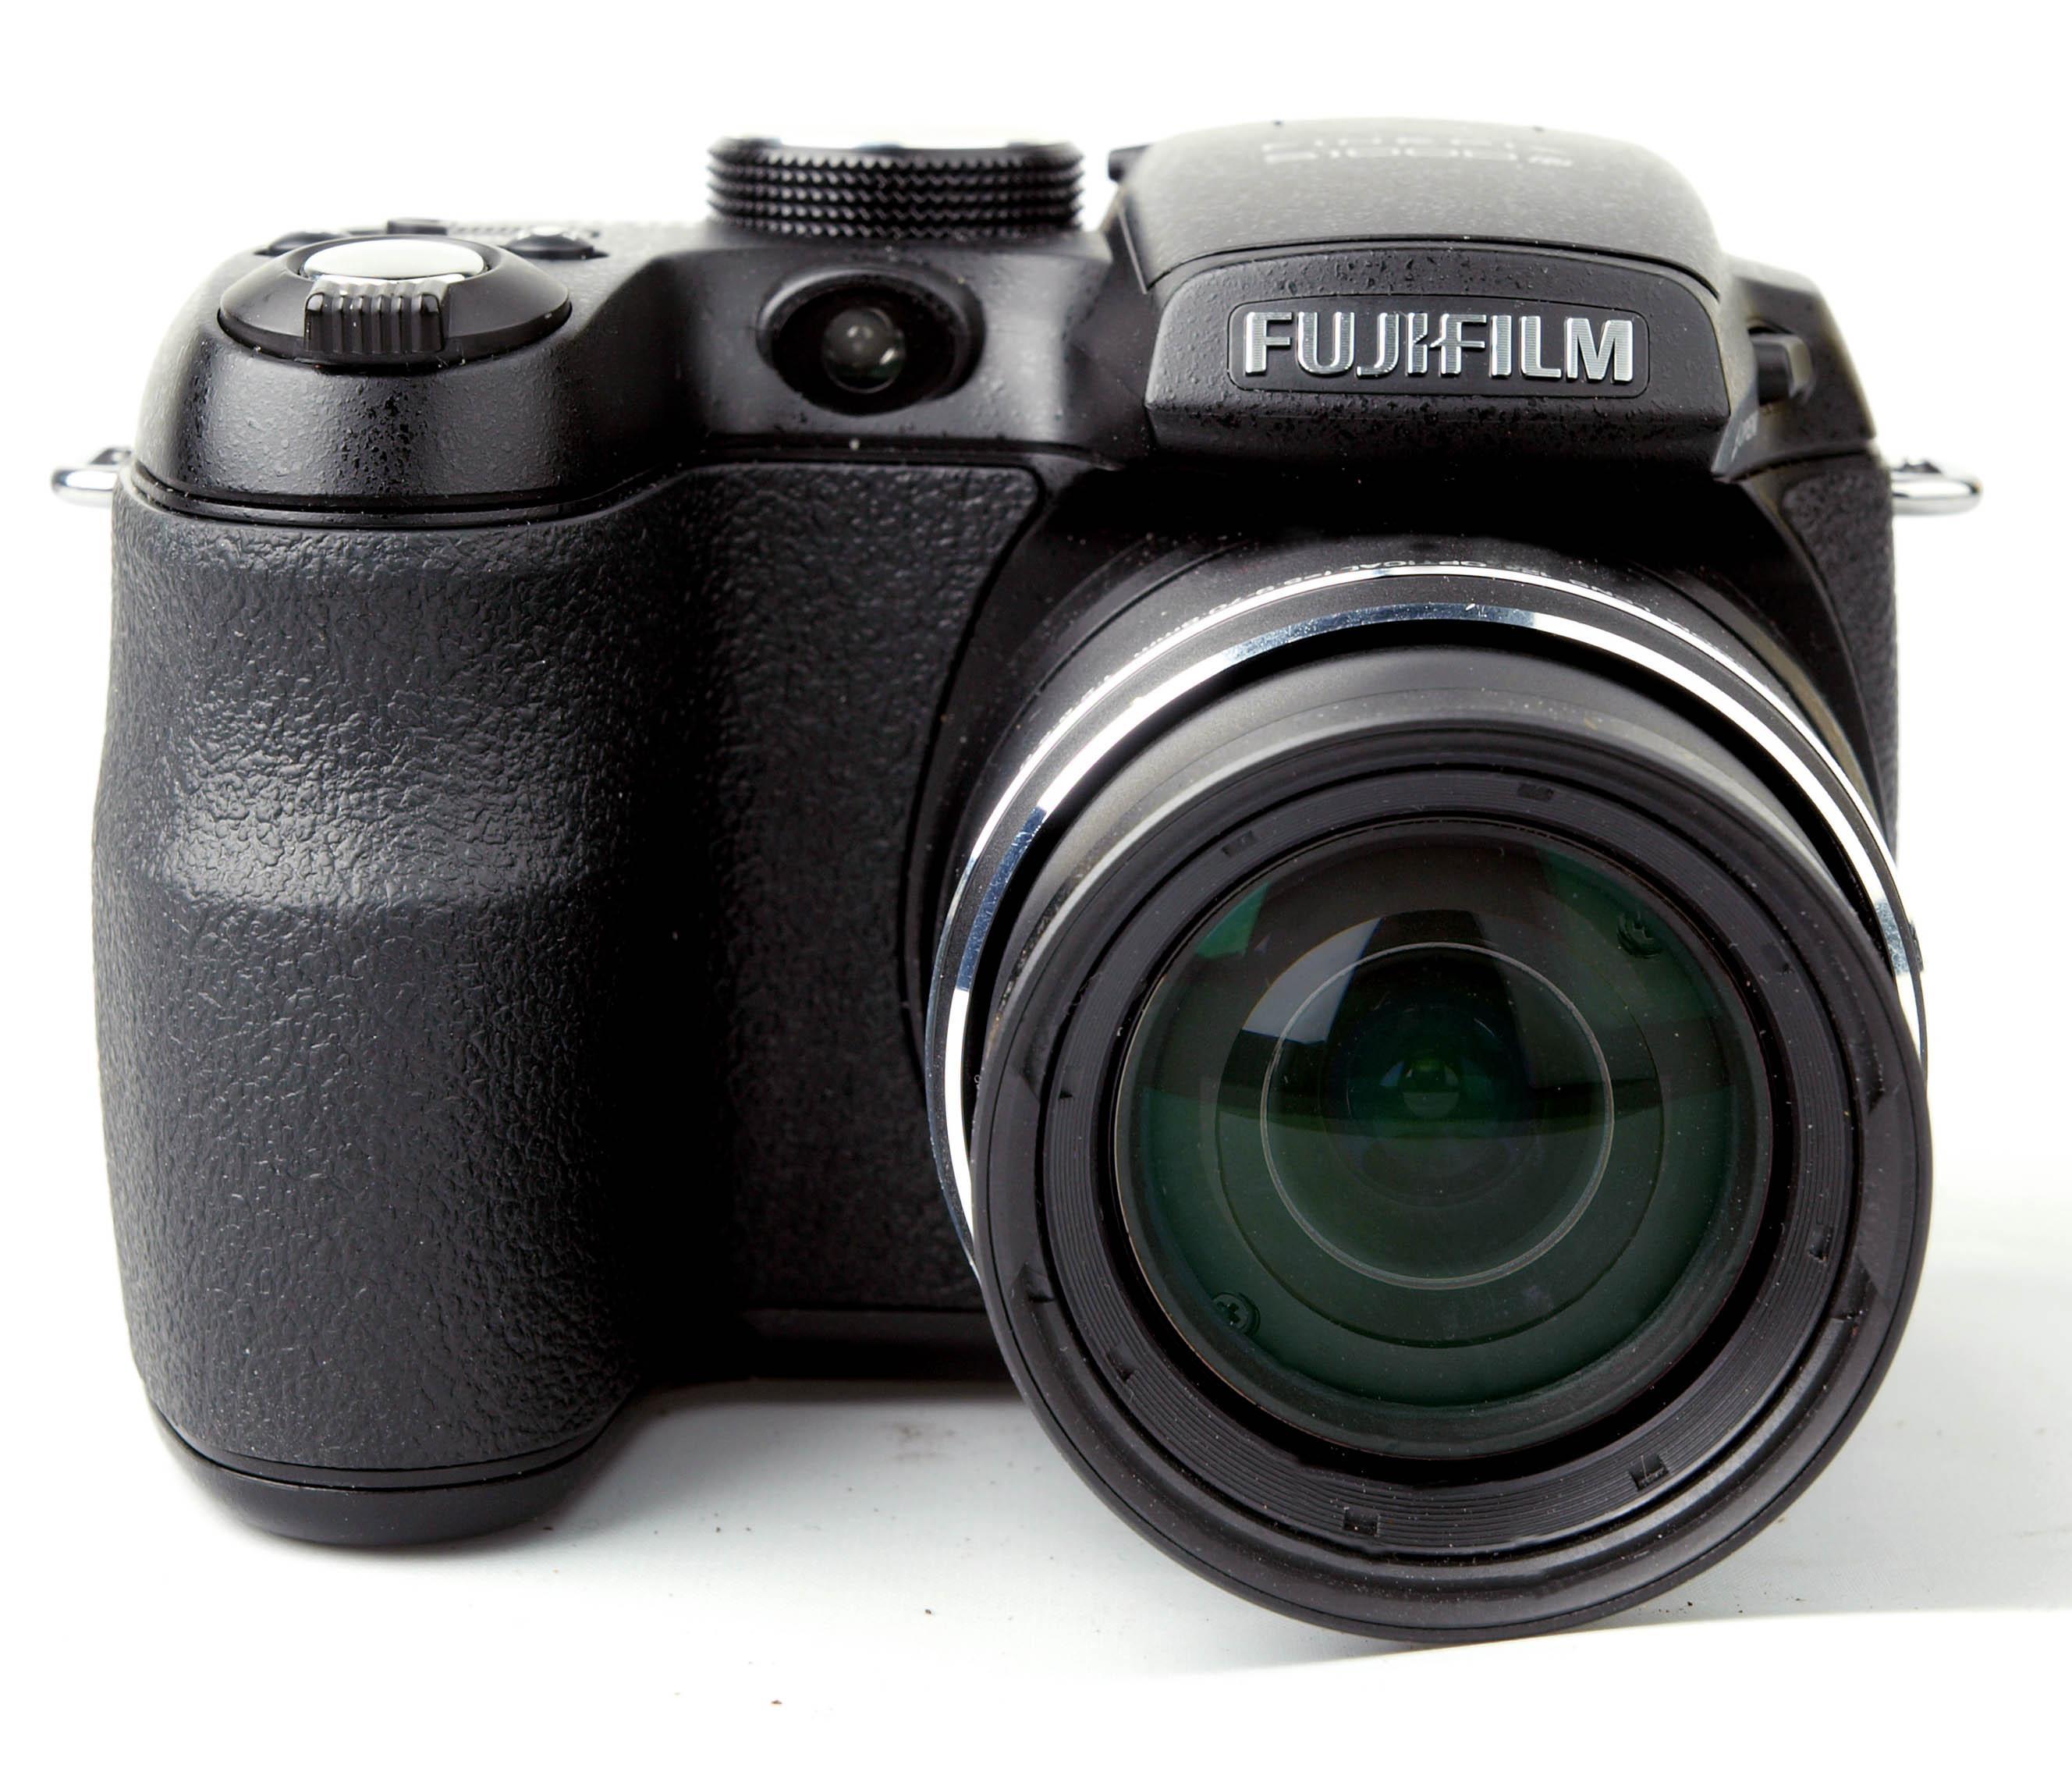 Fuji_s1000fd_front.jpg